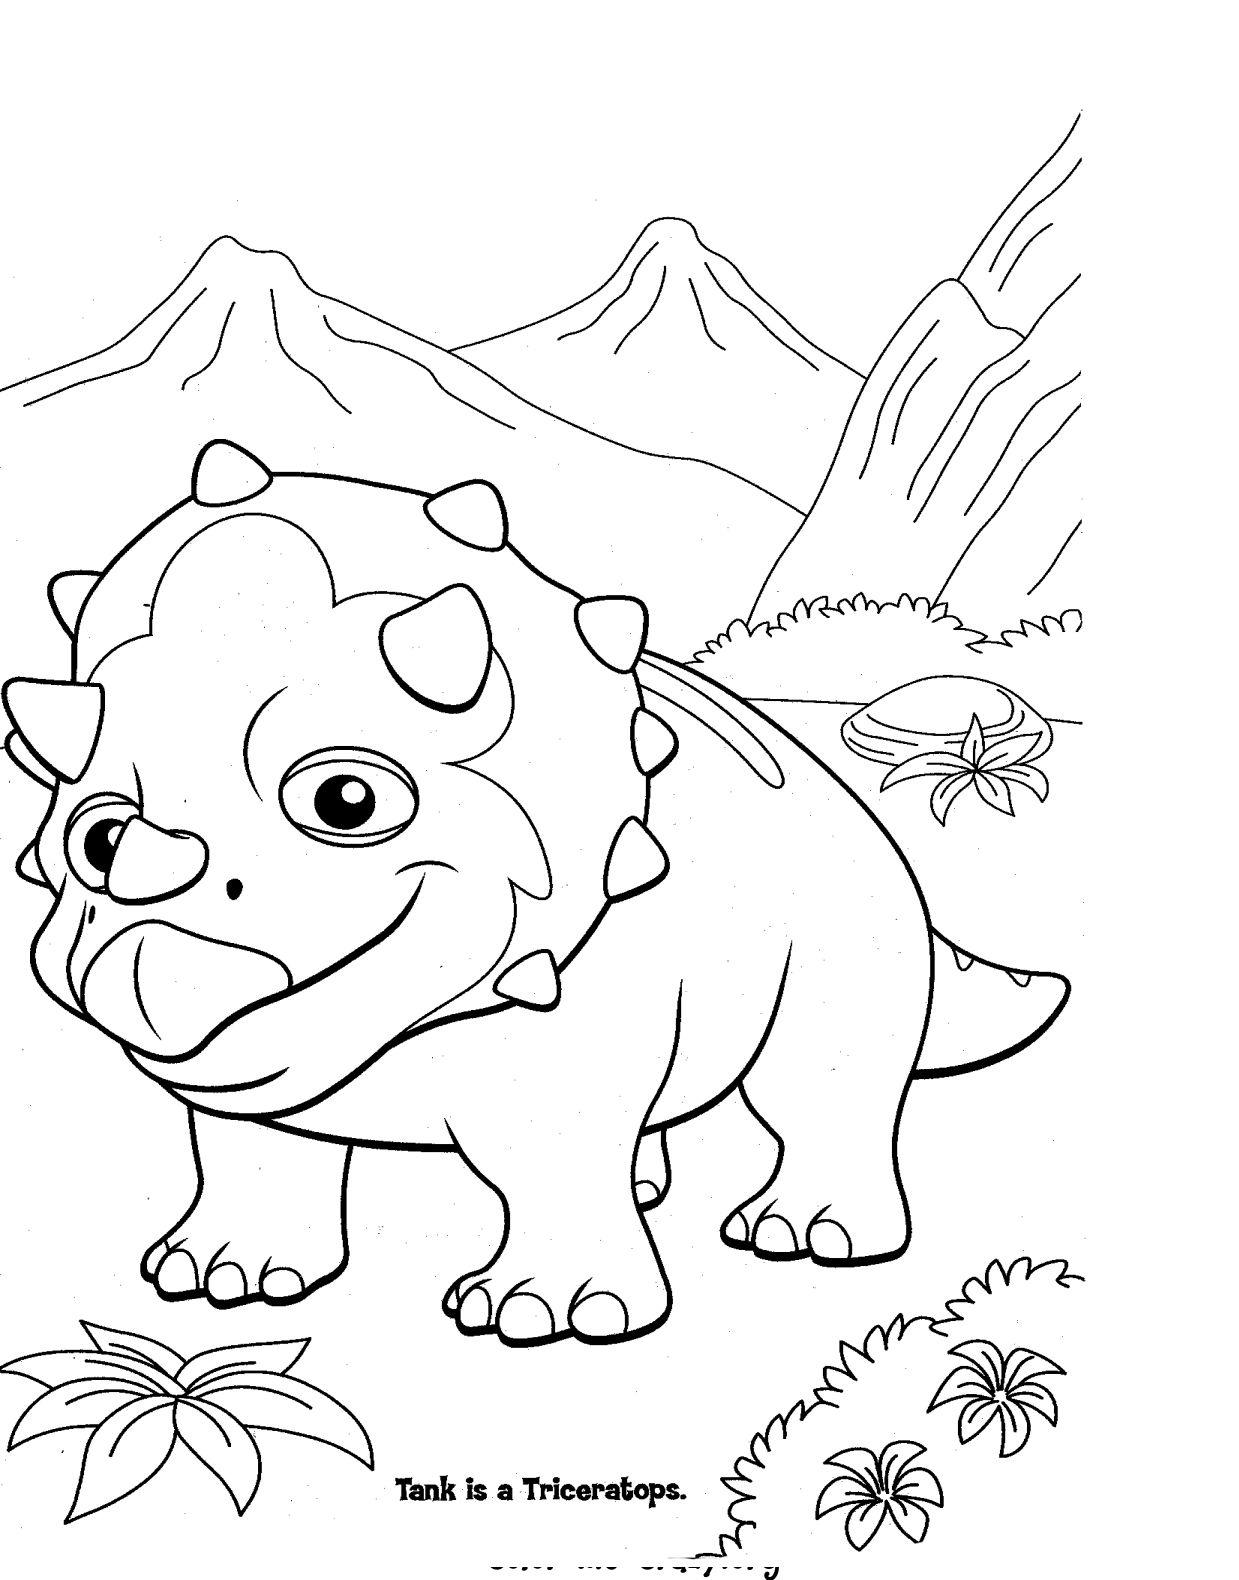 free printable dinosaur coloring pages dinosaur coloring pages dinopit printable coloring free pages dinosaur